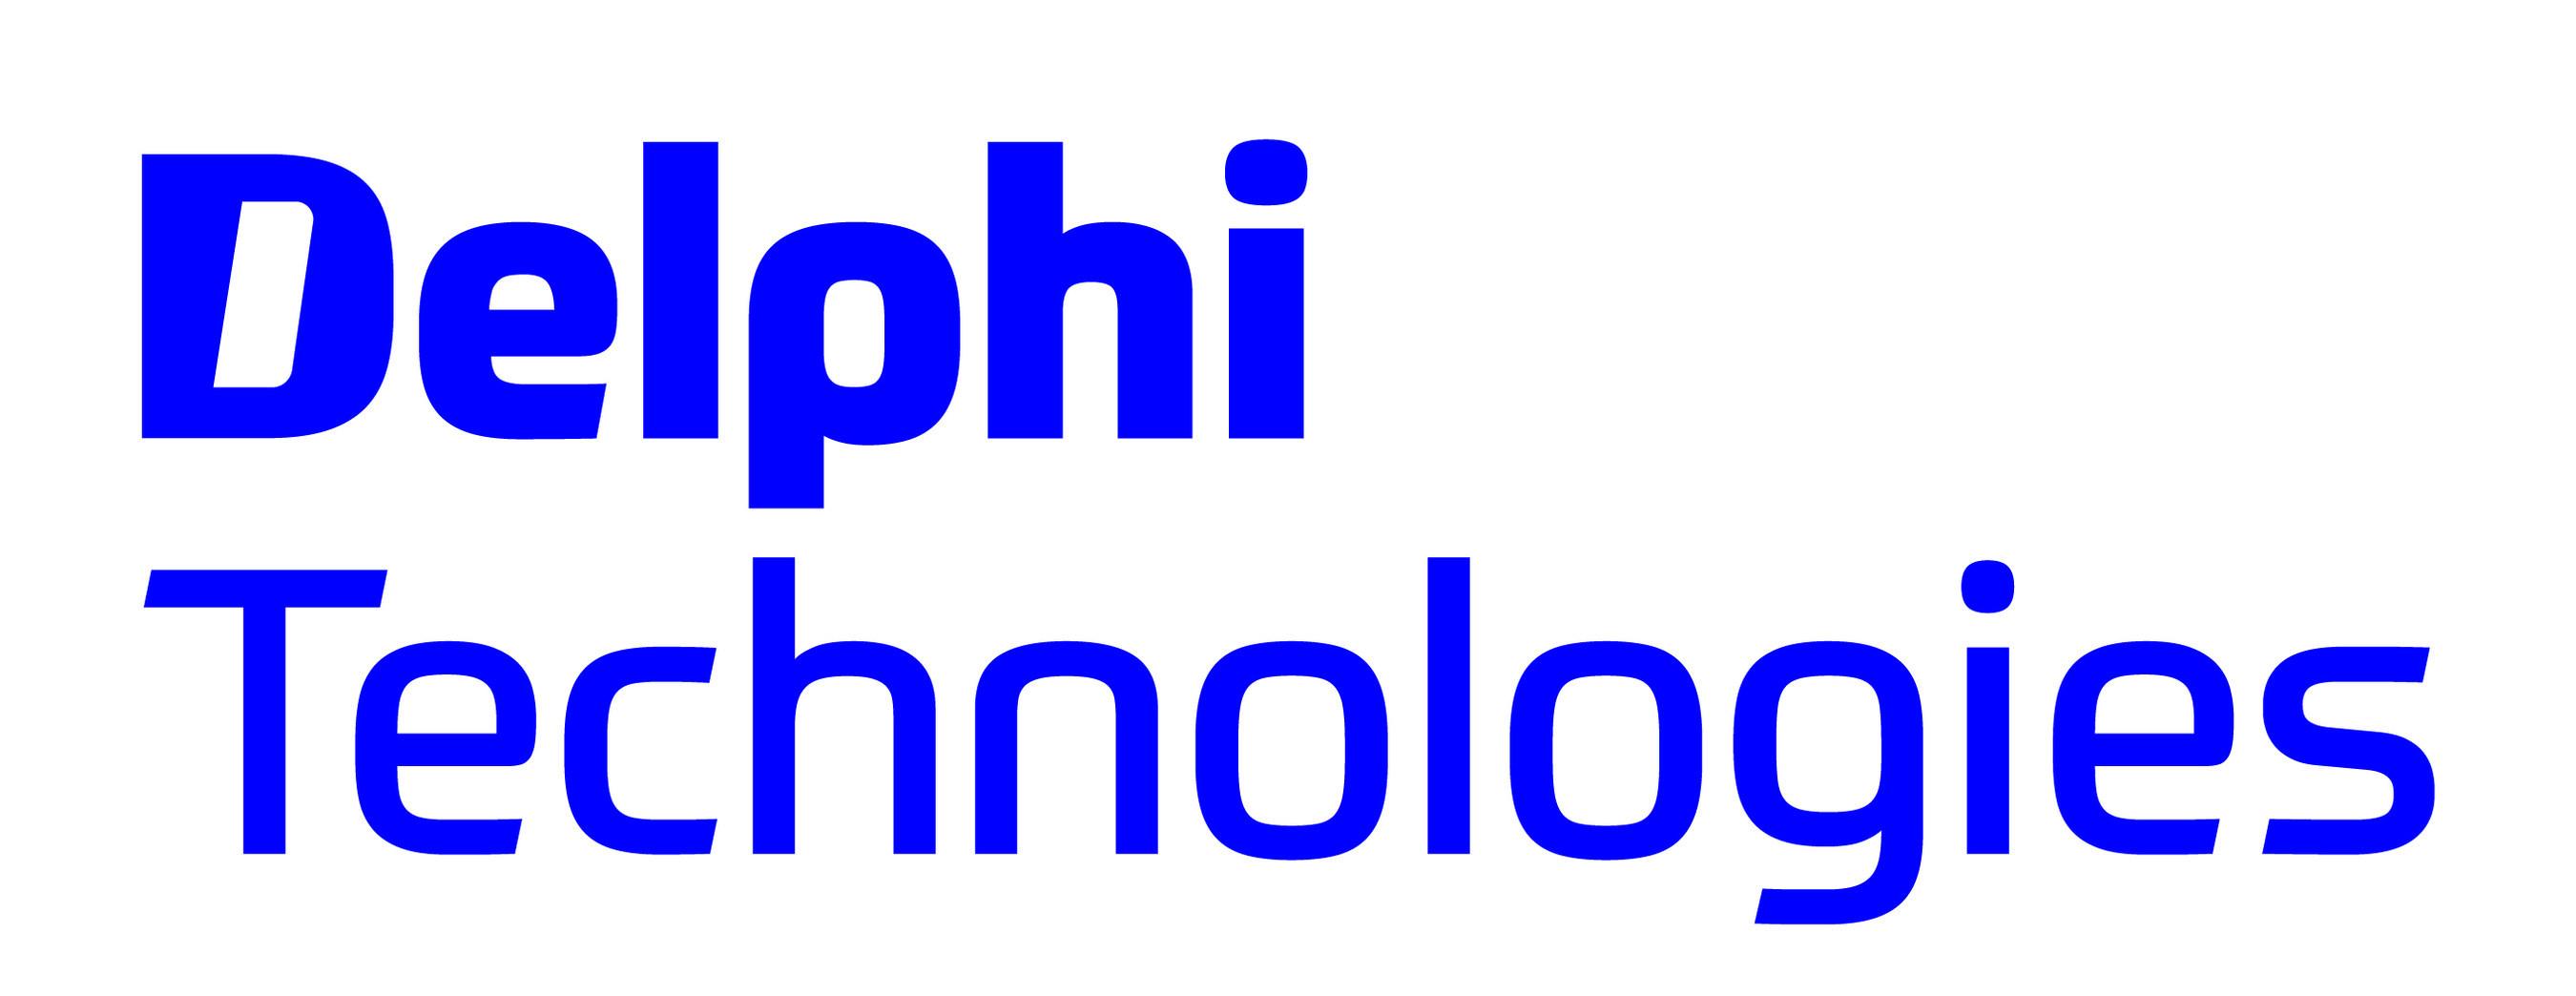 (PRNewsfoto/Delphi Technologies)